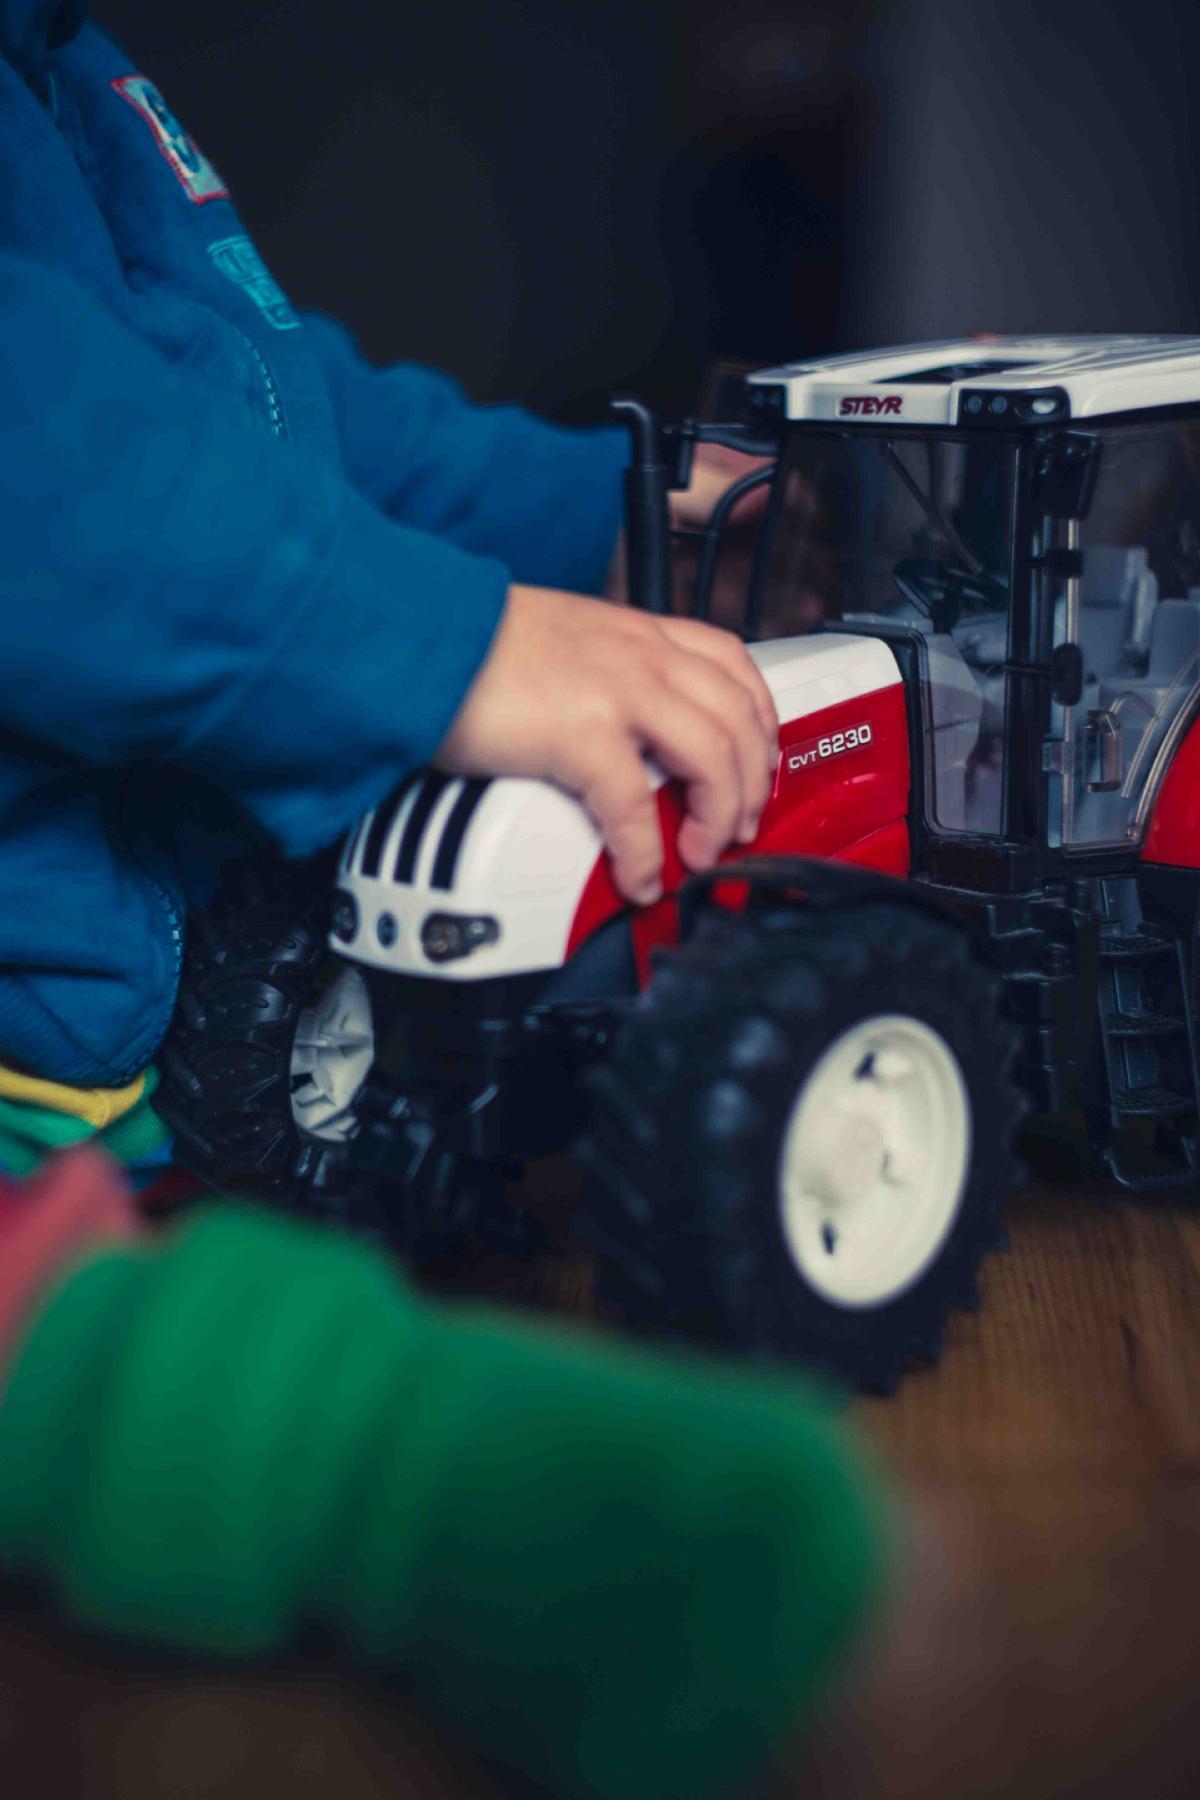 Shop for Truck Toys for Hatchett's Toys for Tots